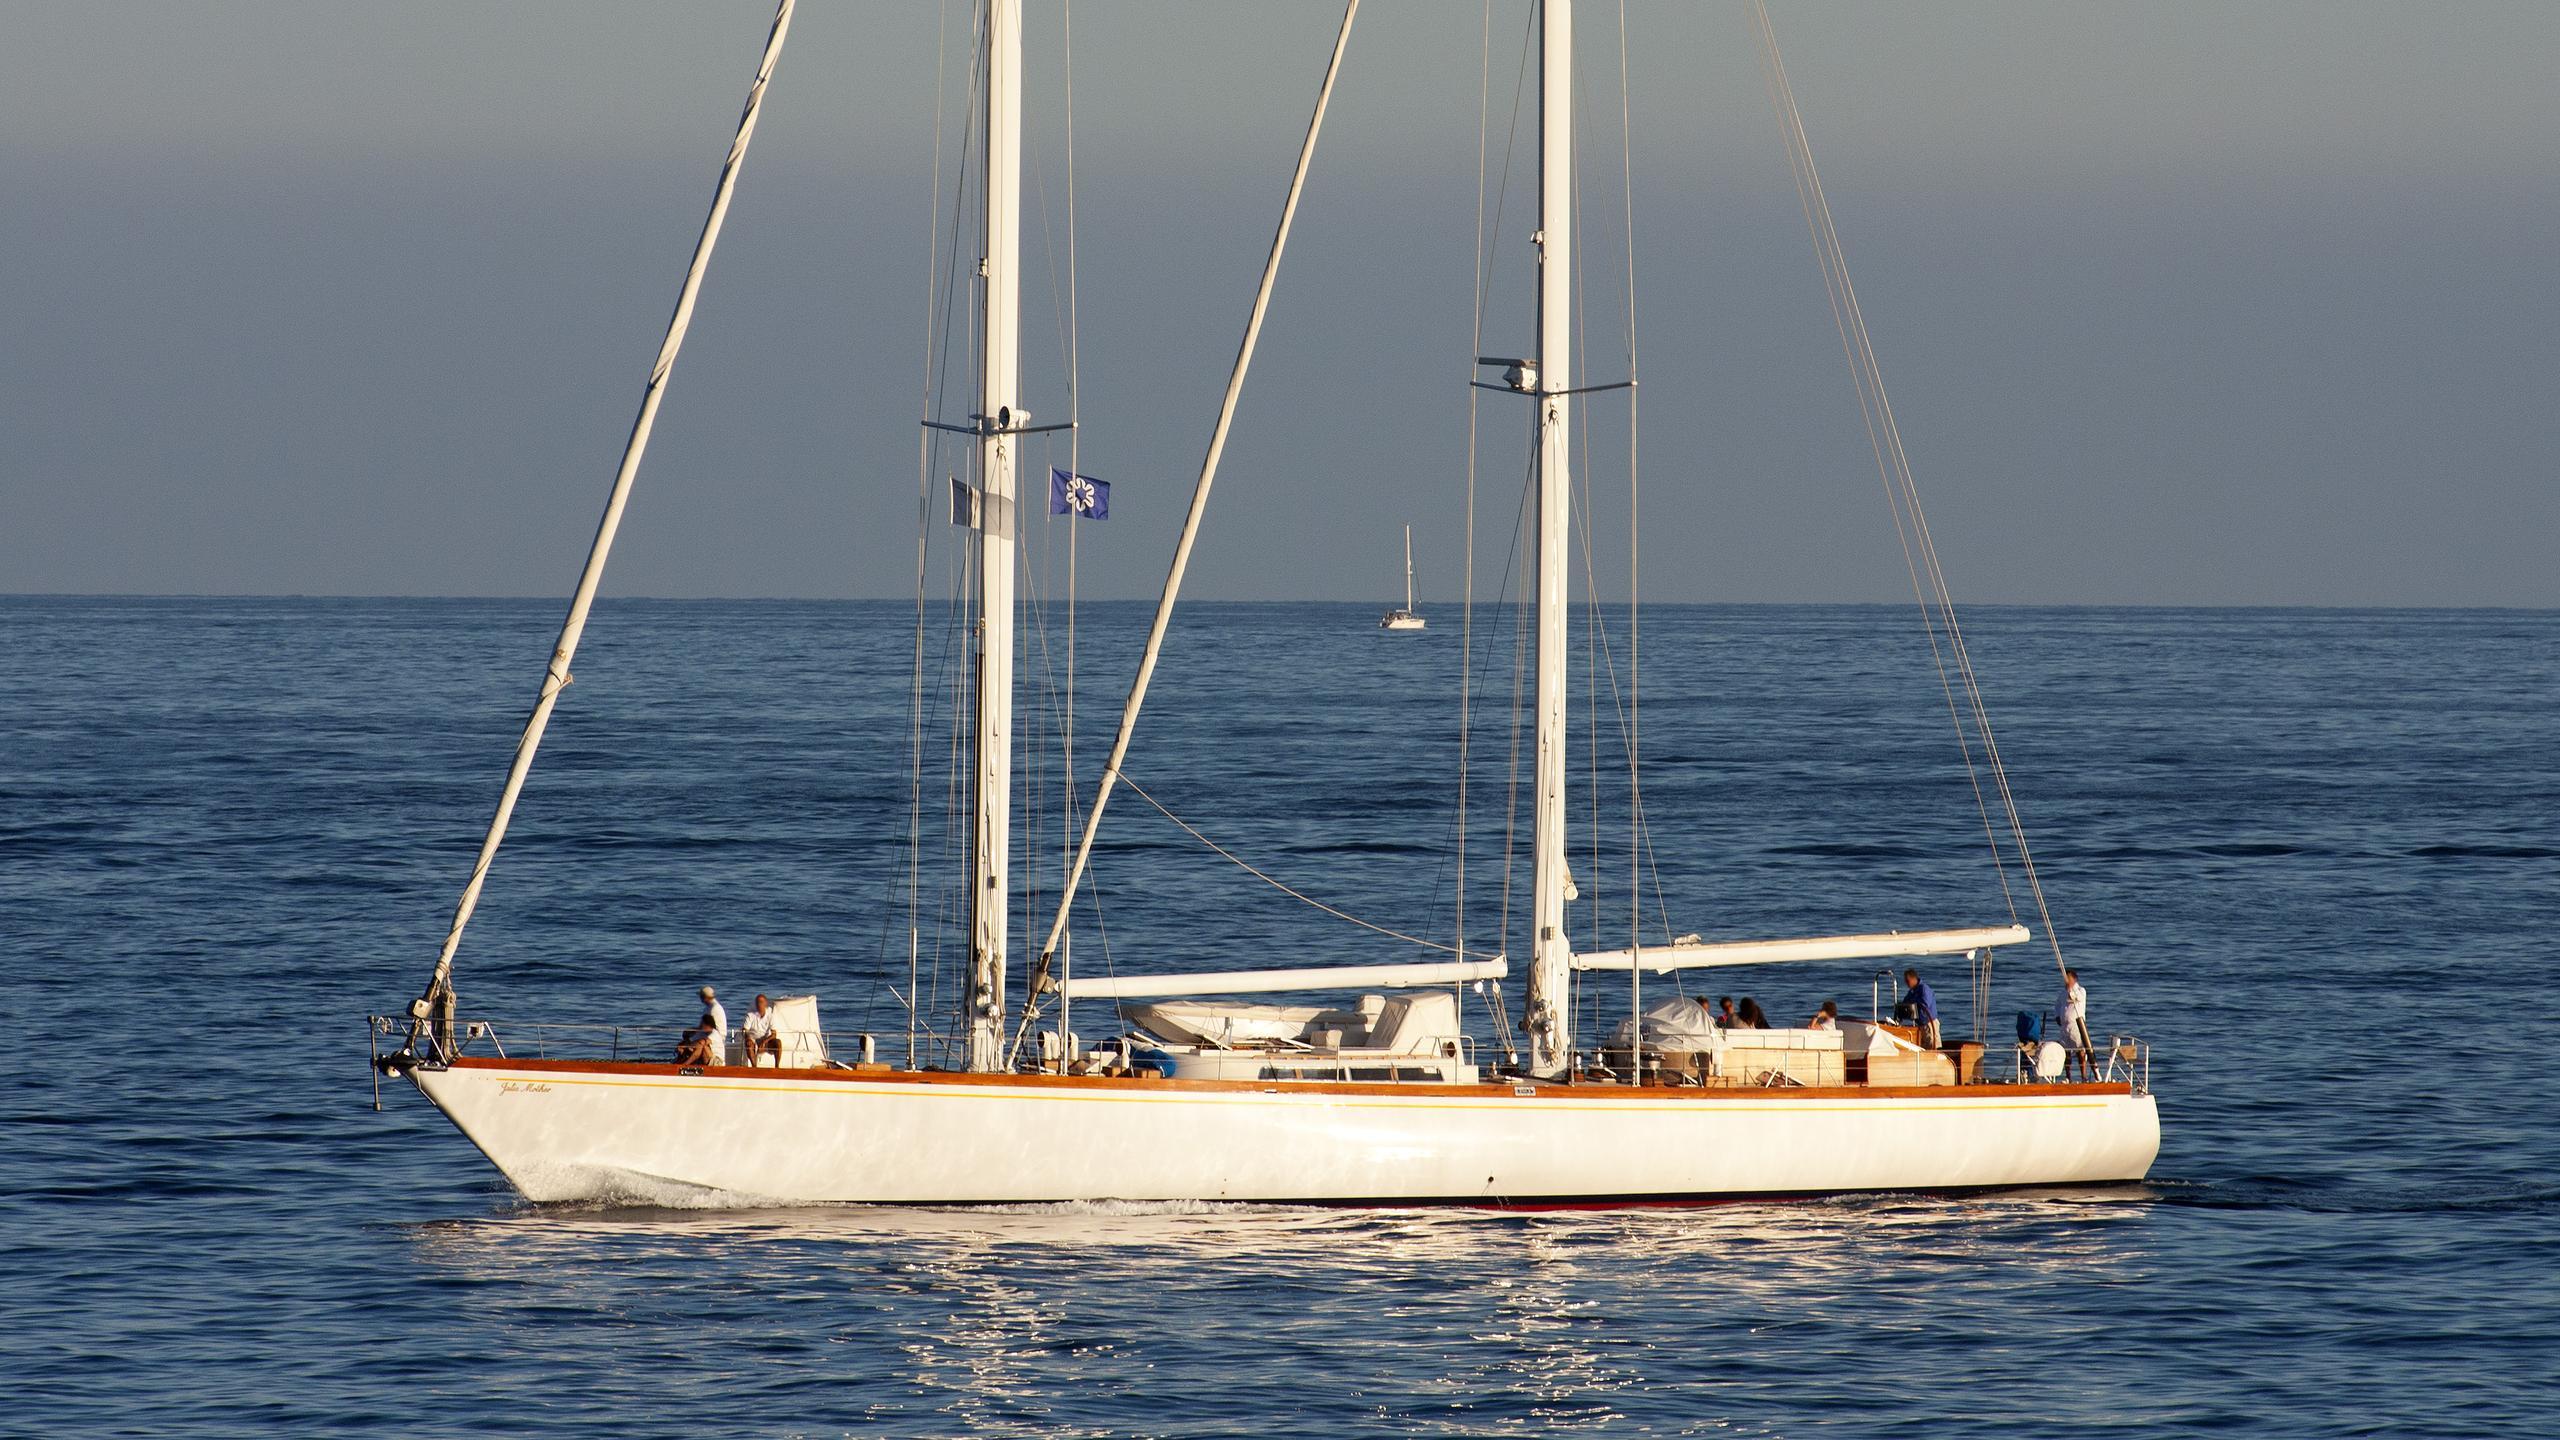 julie-mother-sailing-yacht-sangermani-1978-30m-profile